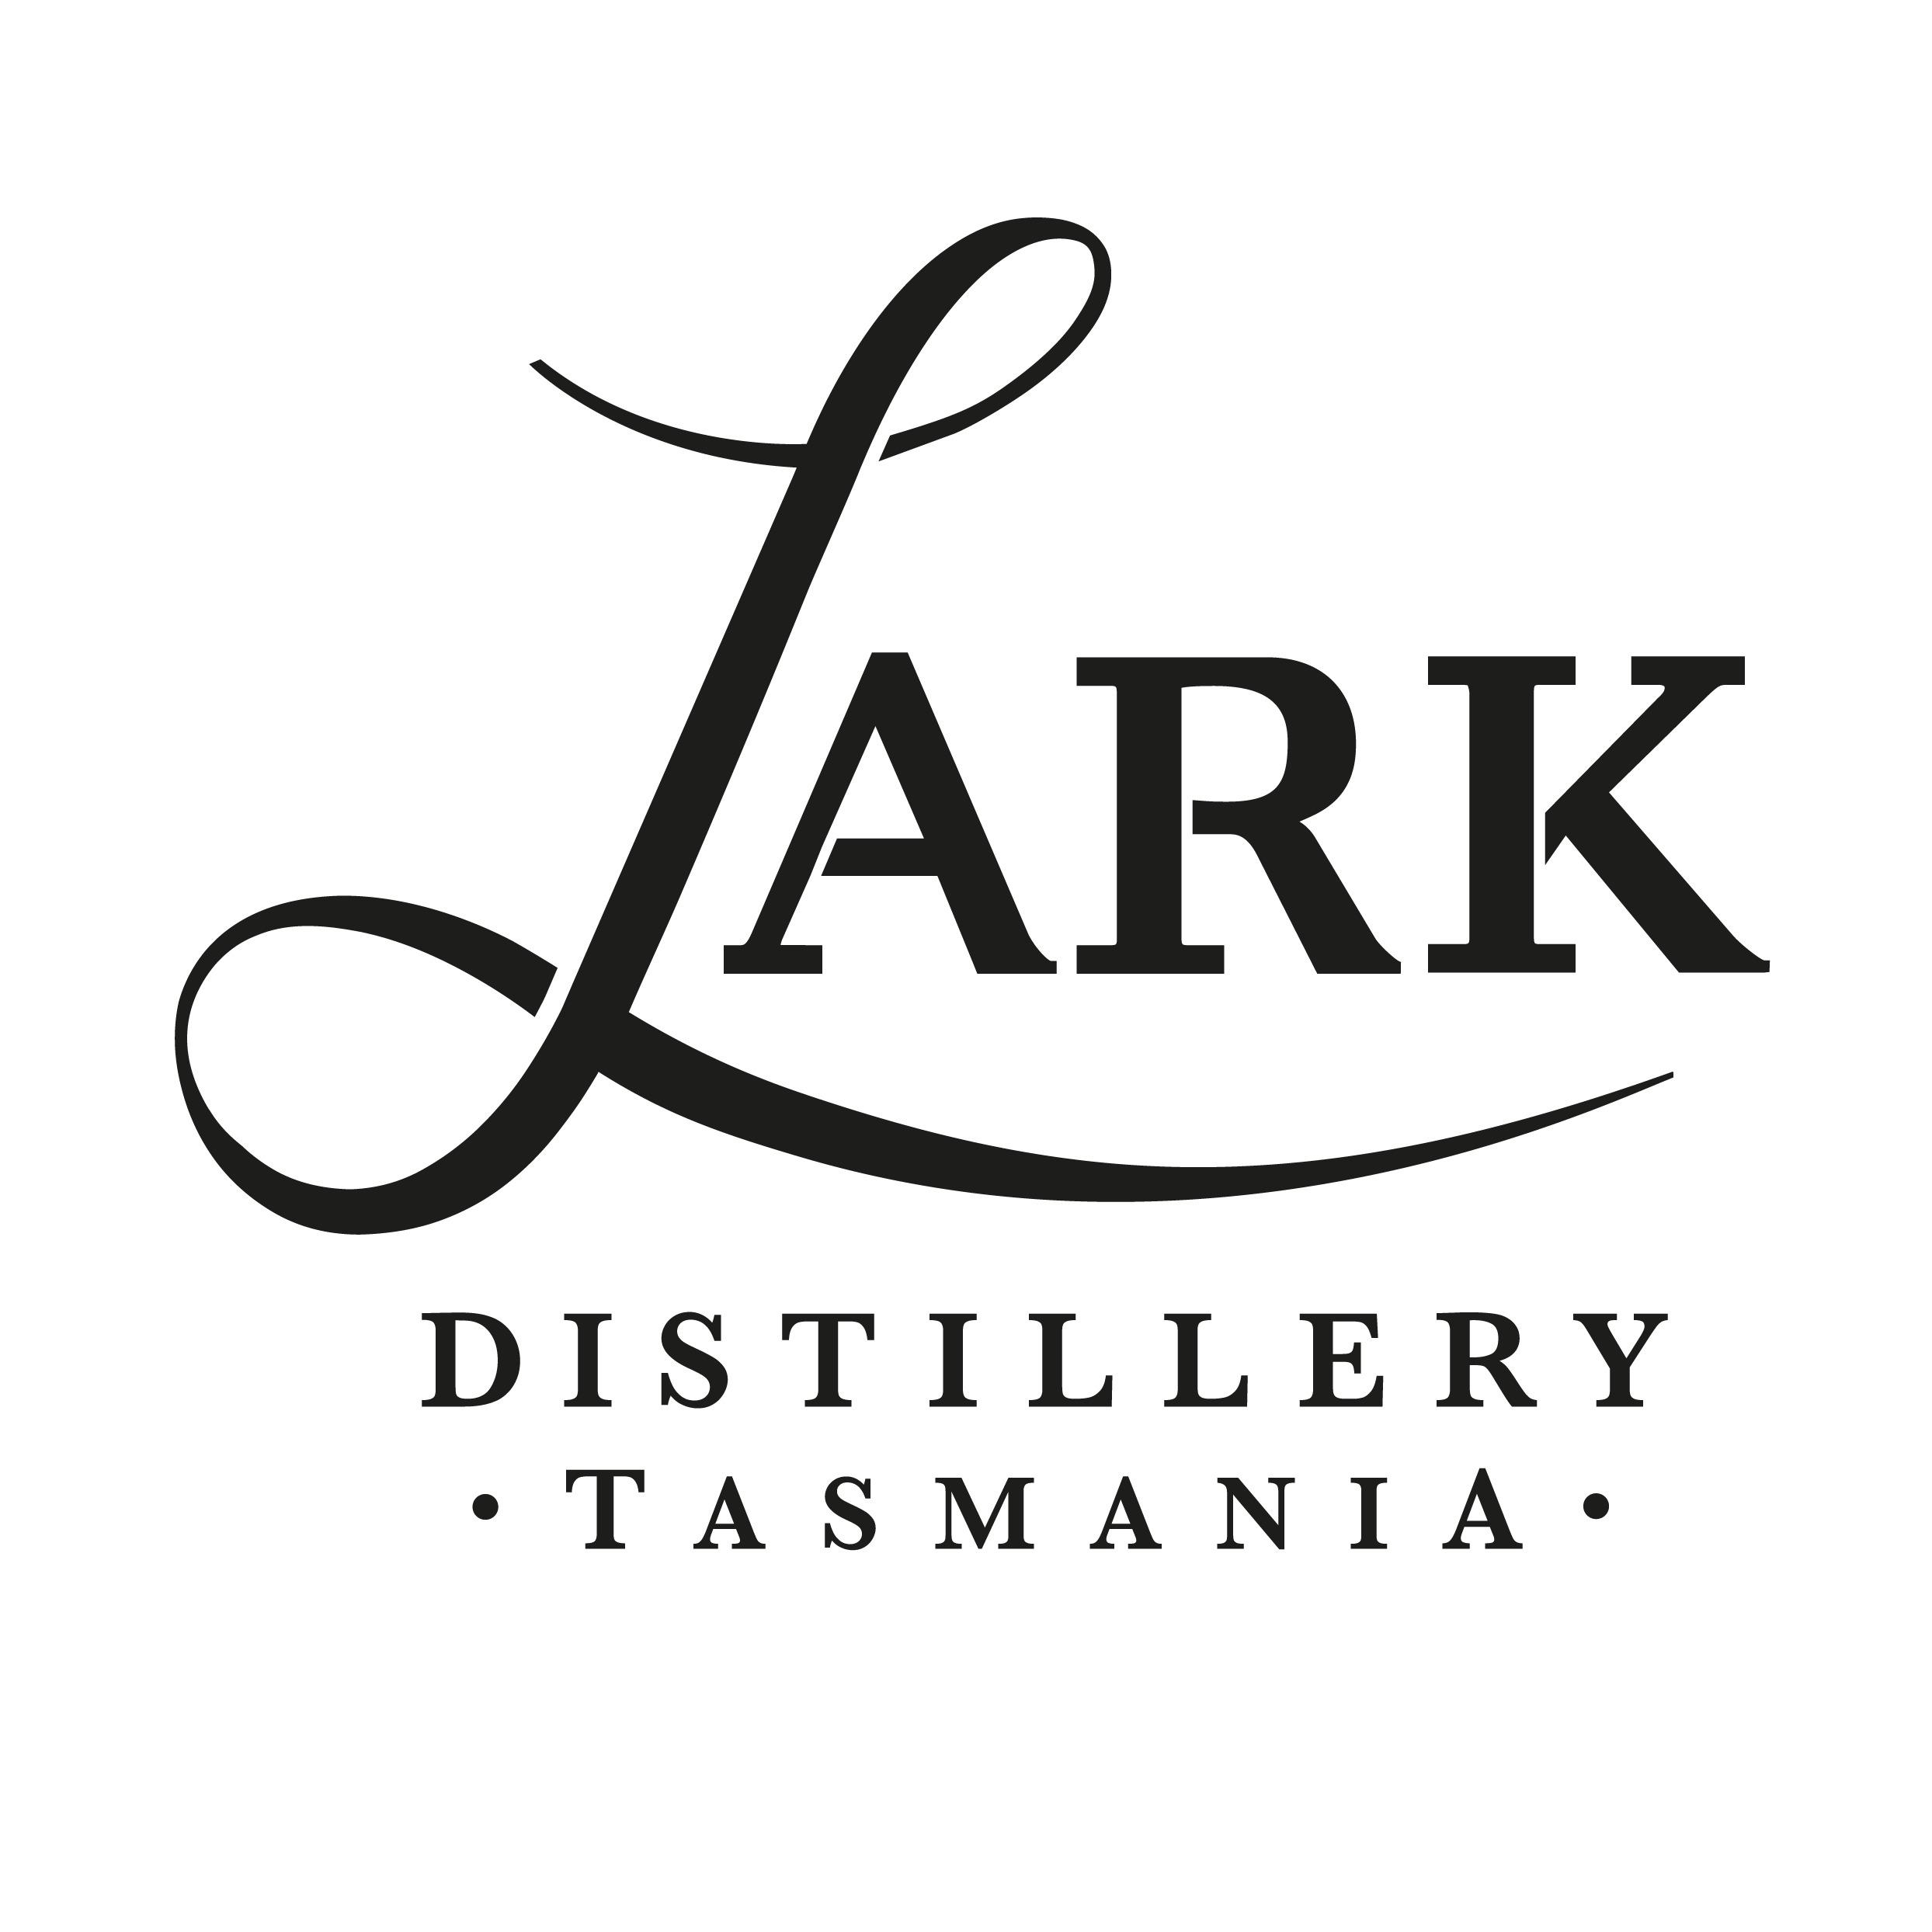 LARK DISTILLING CO. LTD